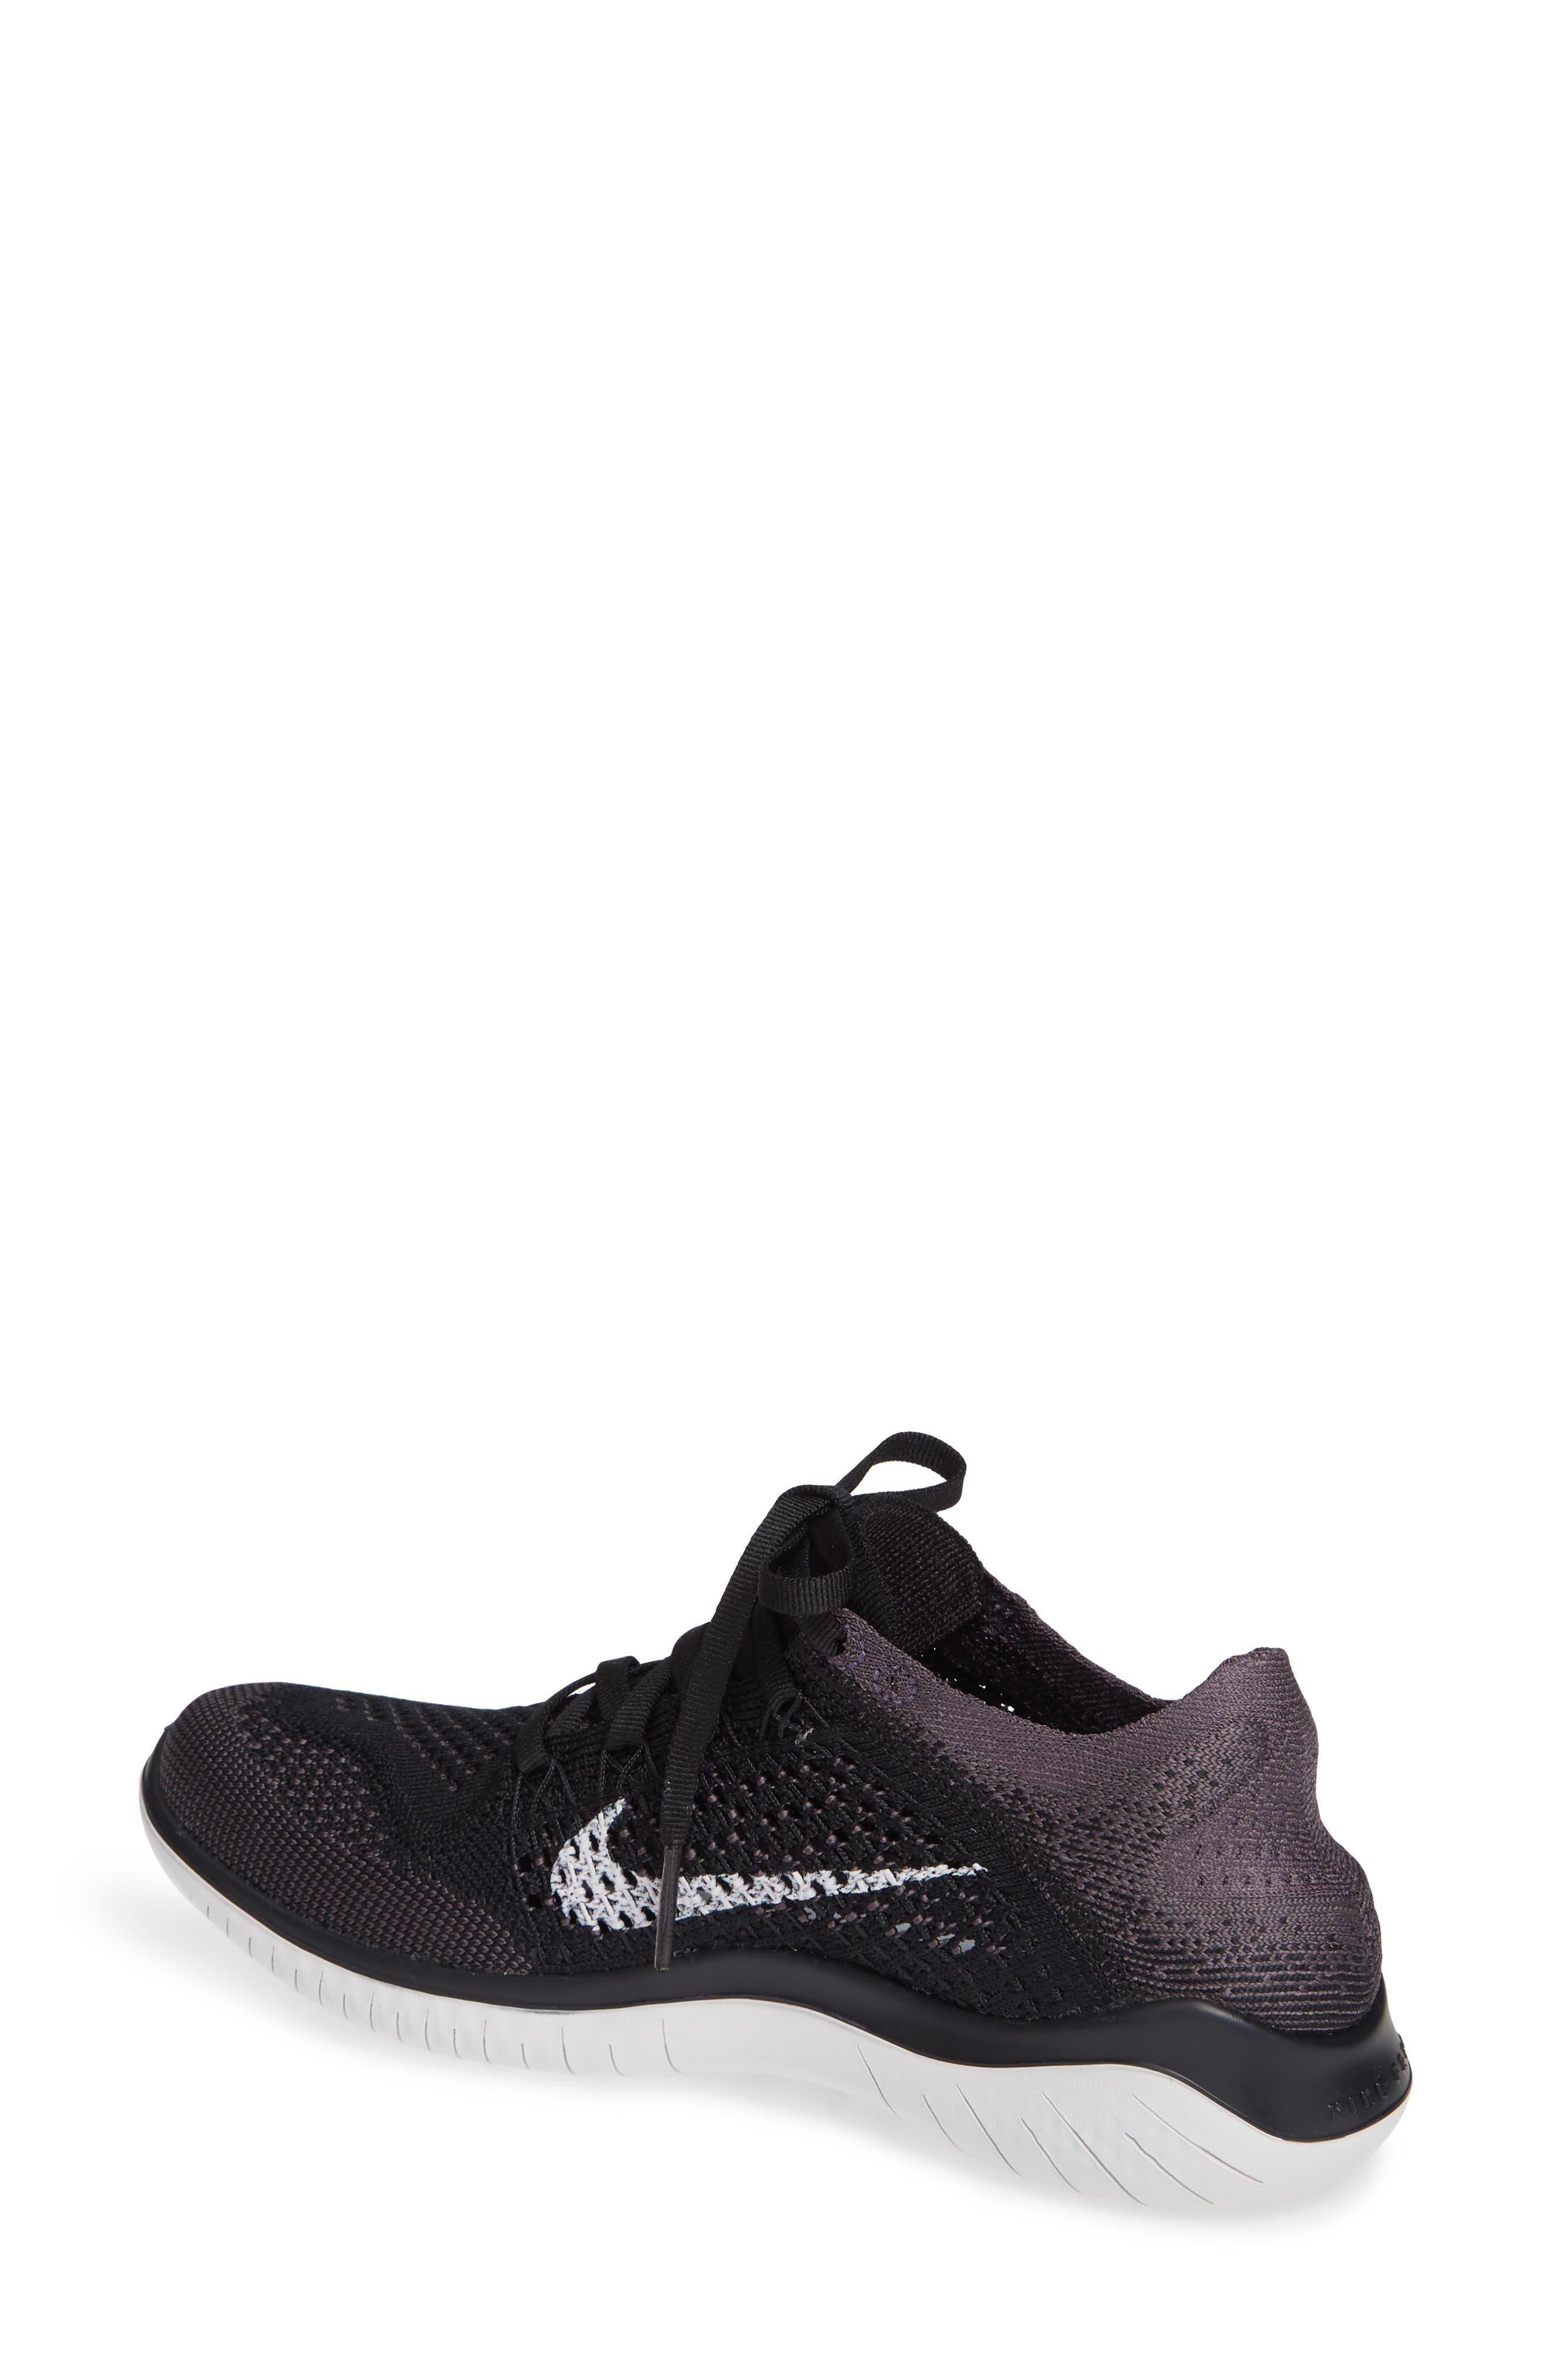 NIKE, Free RN Flyknit 2018 Running Shoe, Alternate thumbnail 2, color, BLACK/ VAST GREY/ GOLD